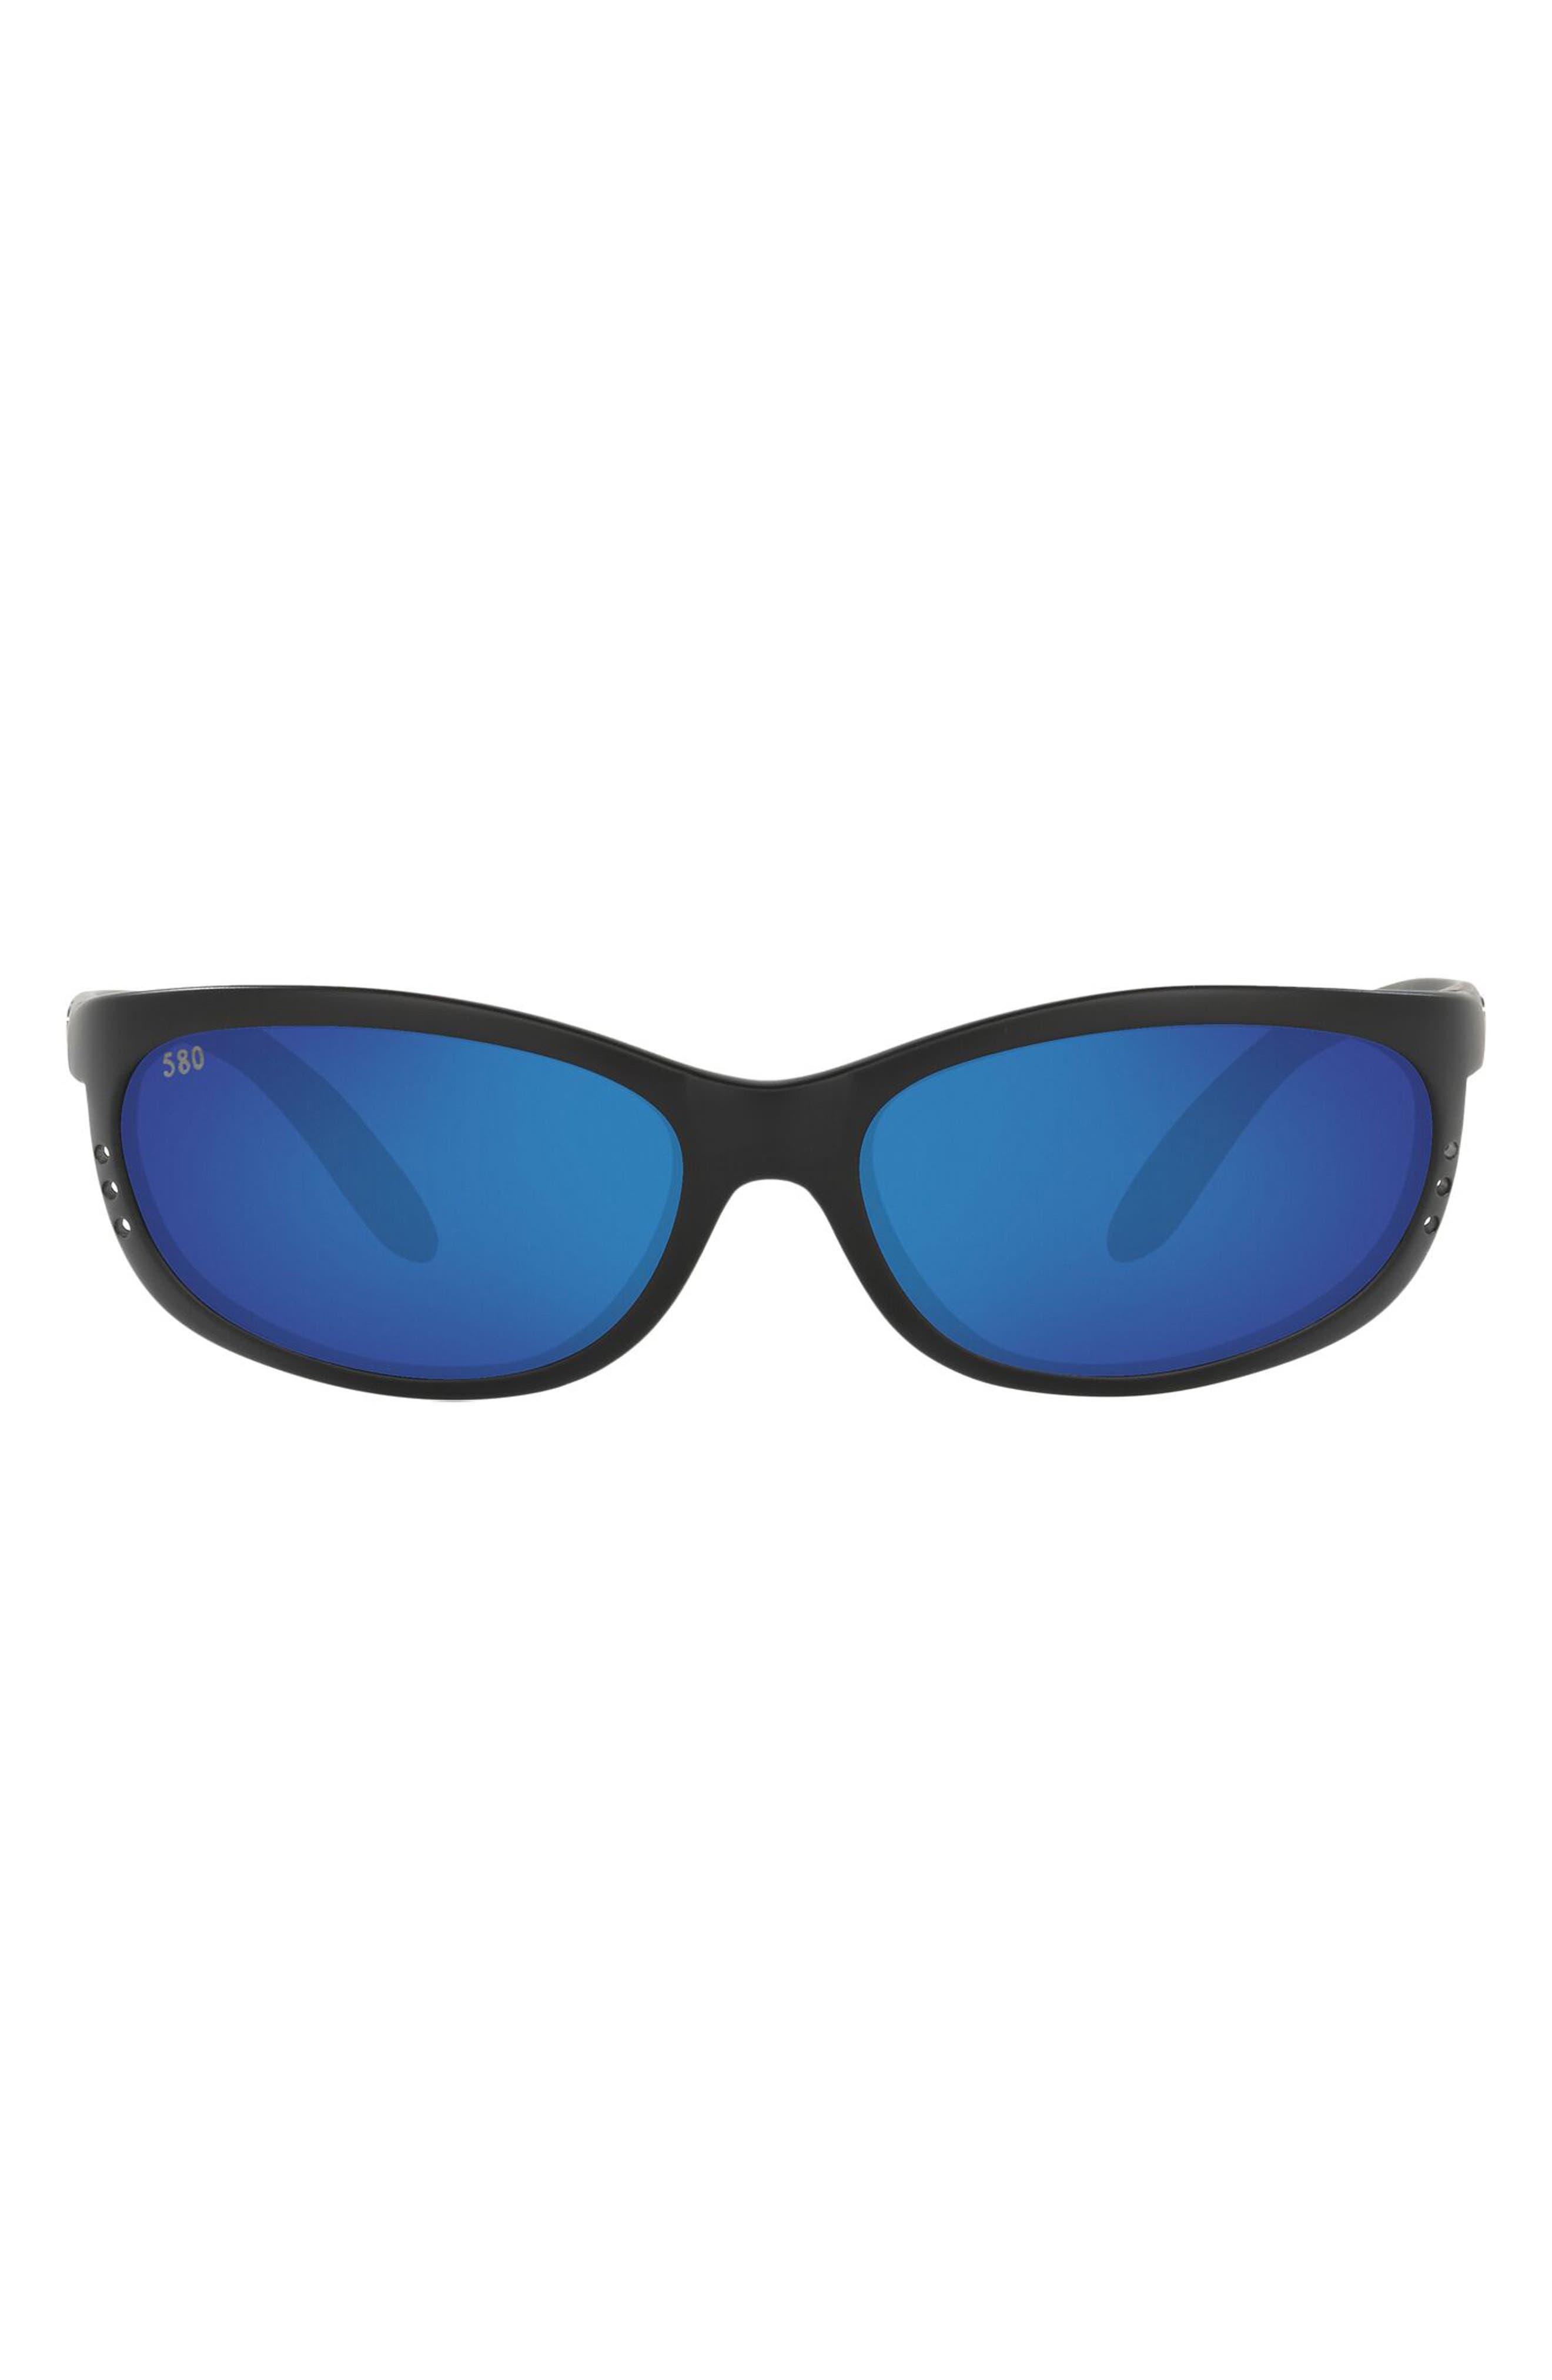 61mm Polarized Oval Sunglasses